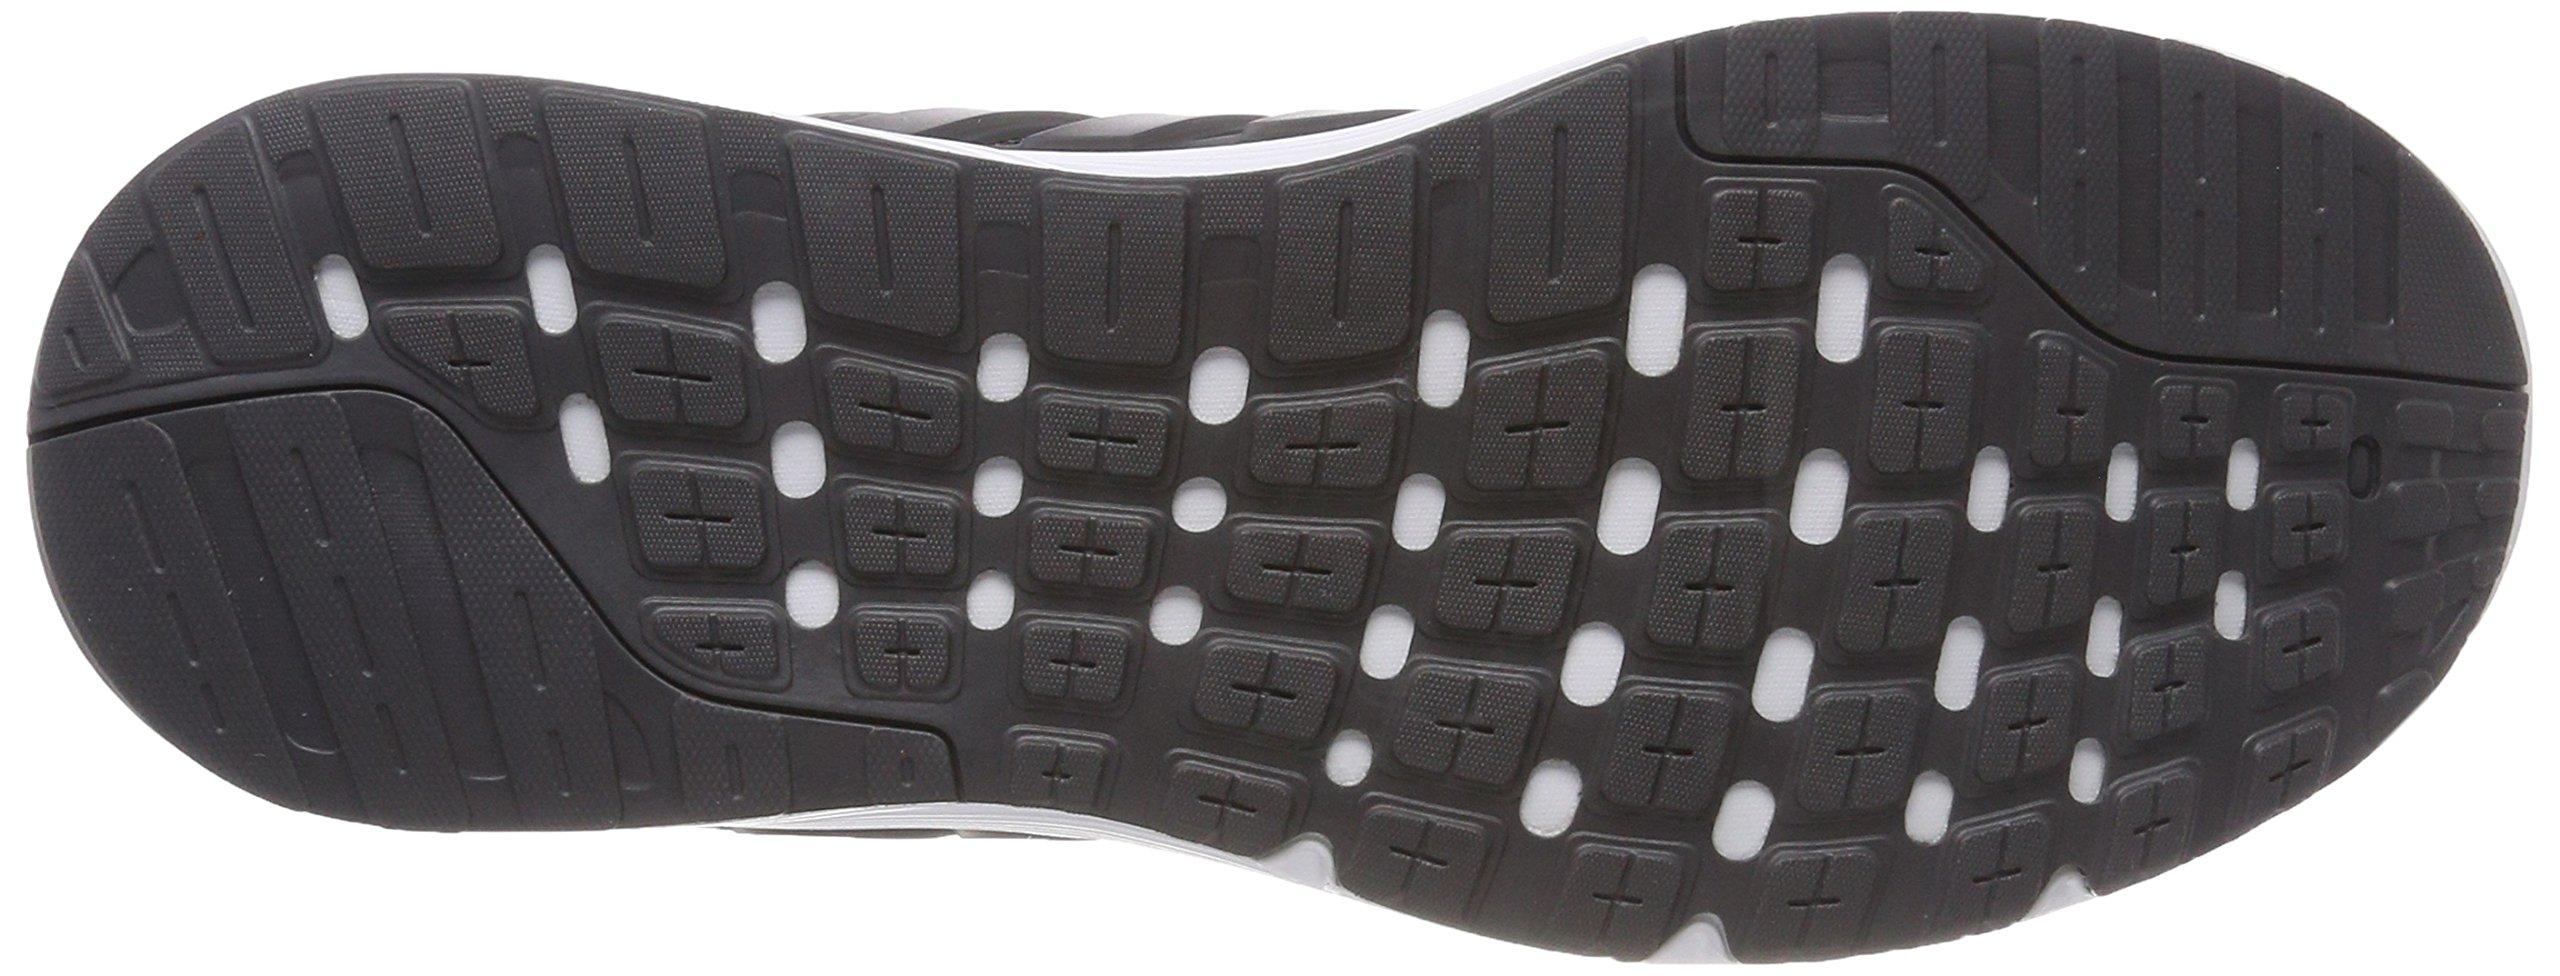 adidas Galaxy 4 Scarpe da Running Uomo 3 spesavip